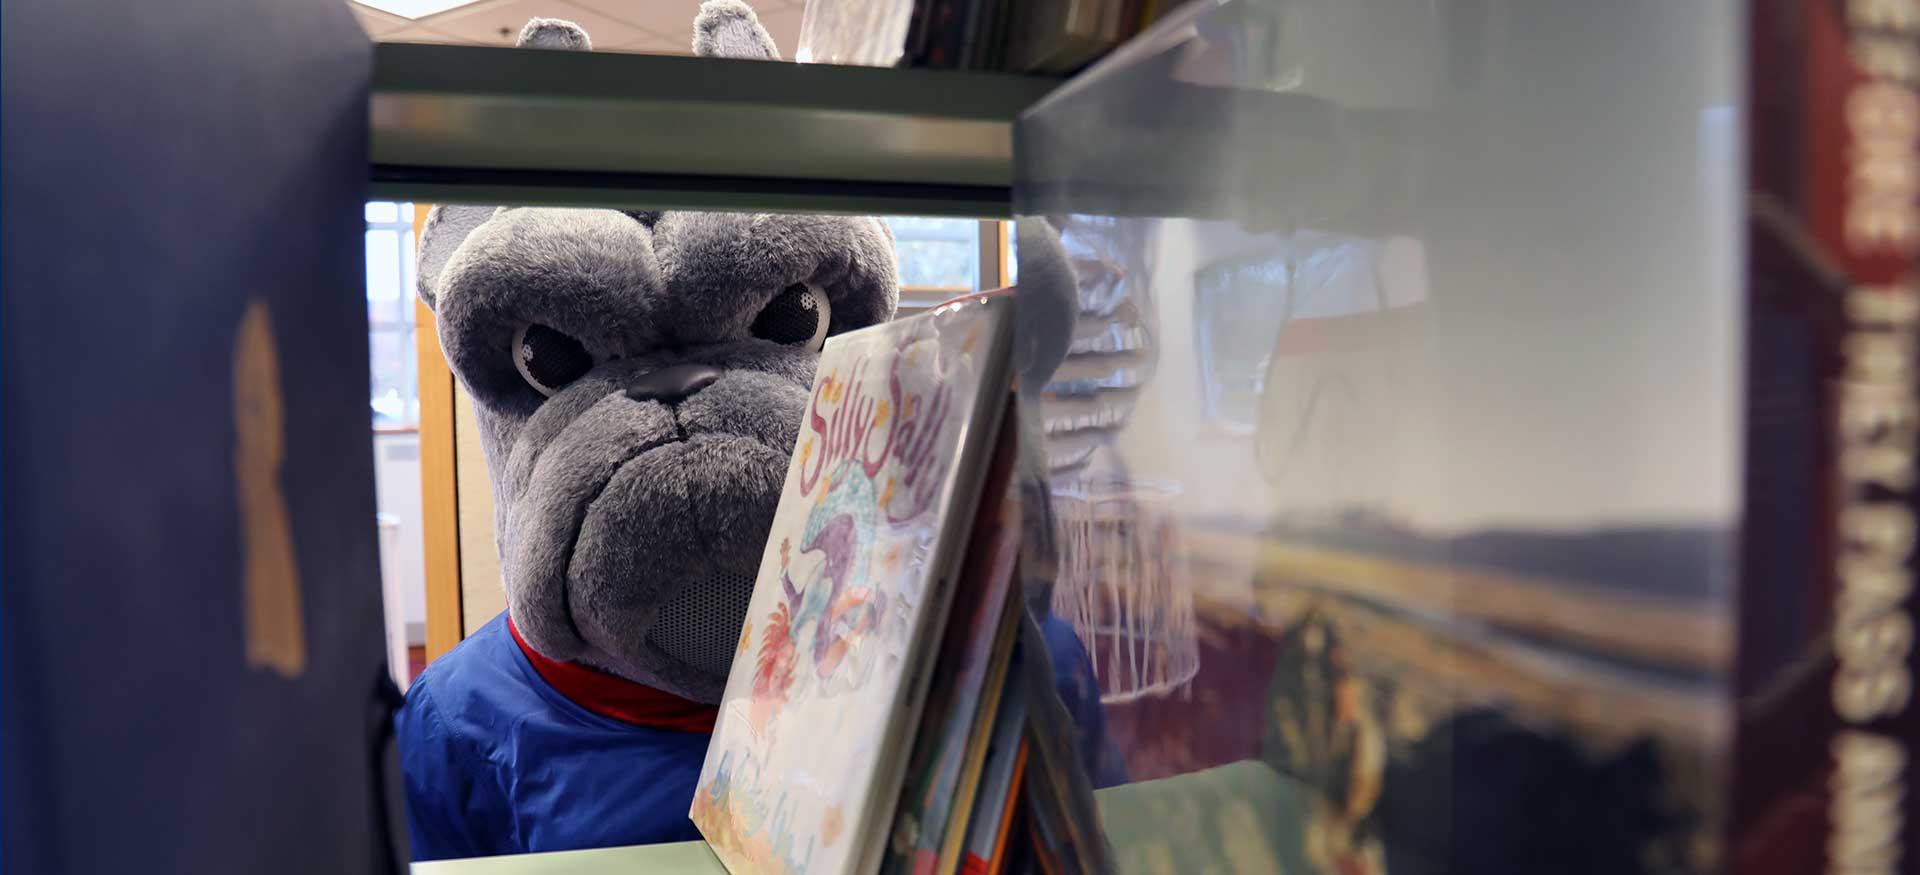 Bulldog peeking through library shelves banner